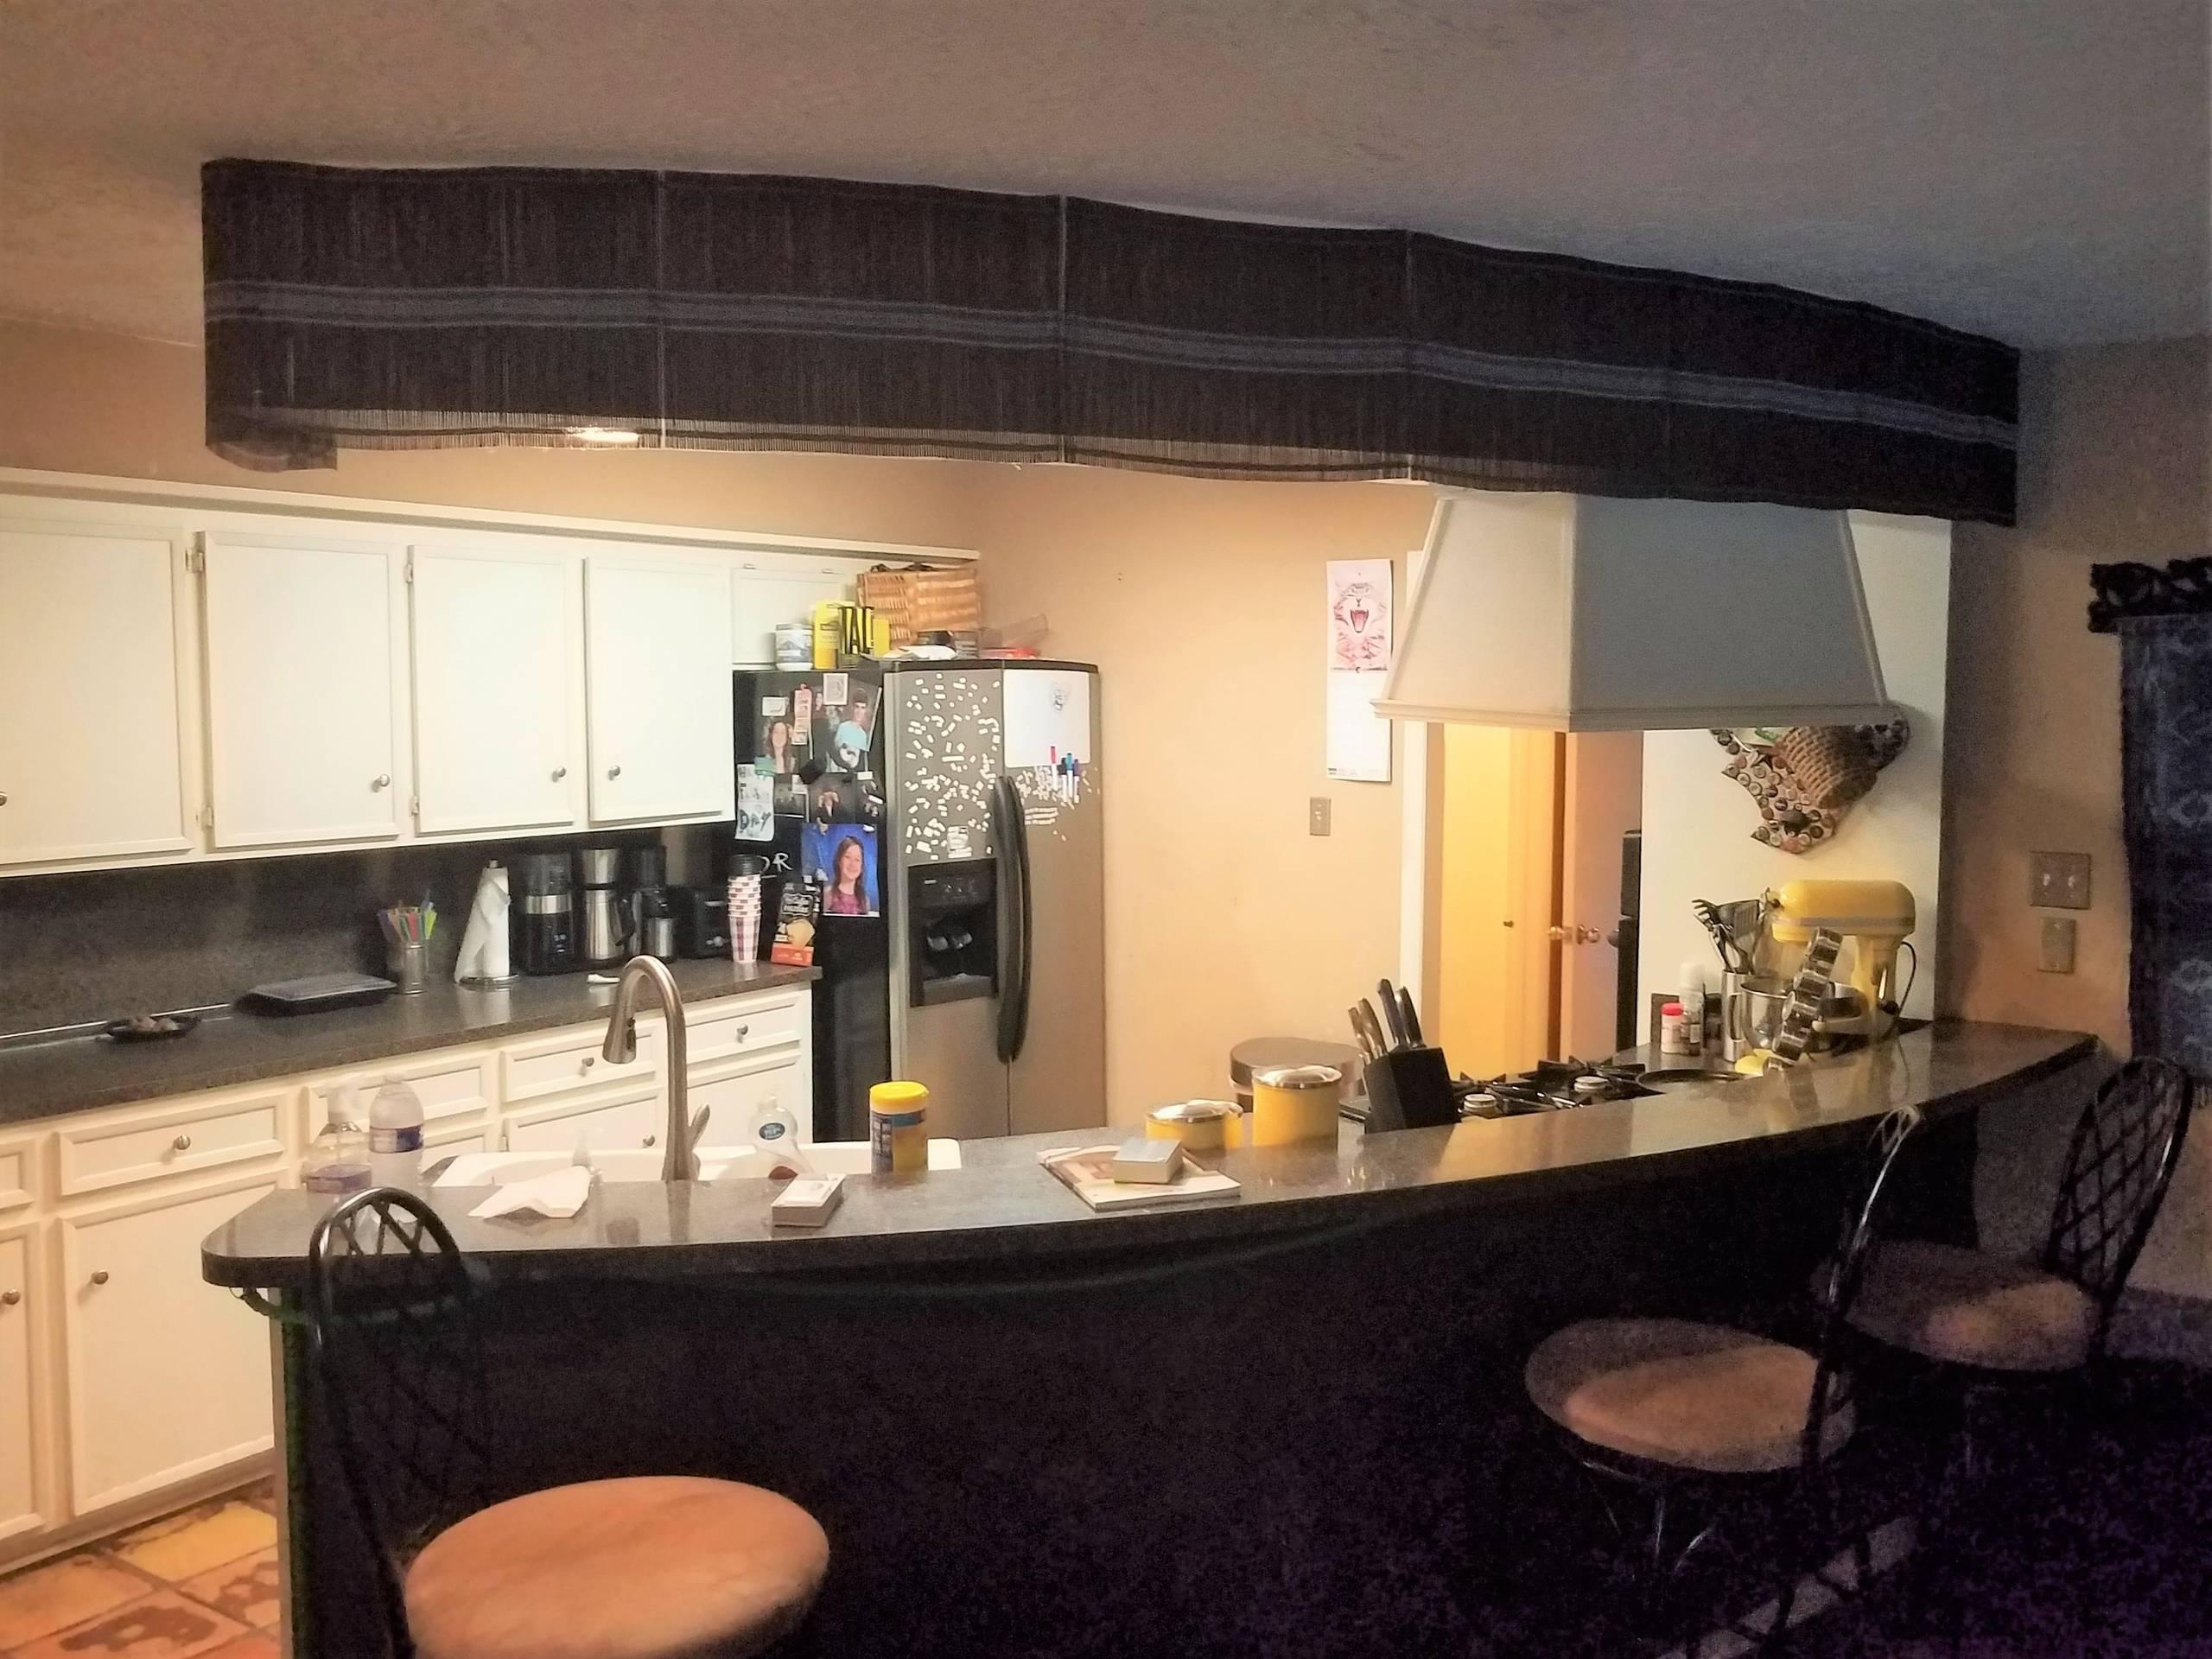 Siding Job Turned Interior Remodel